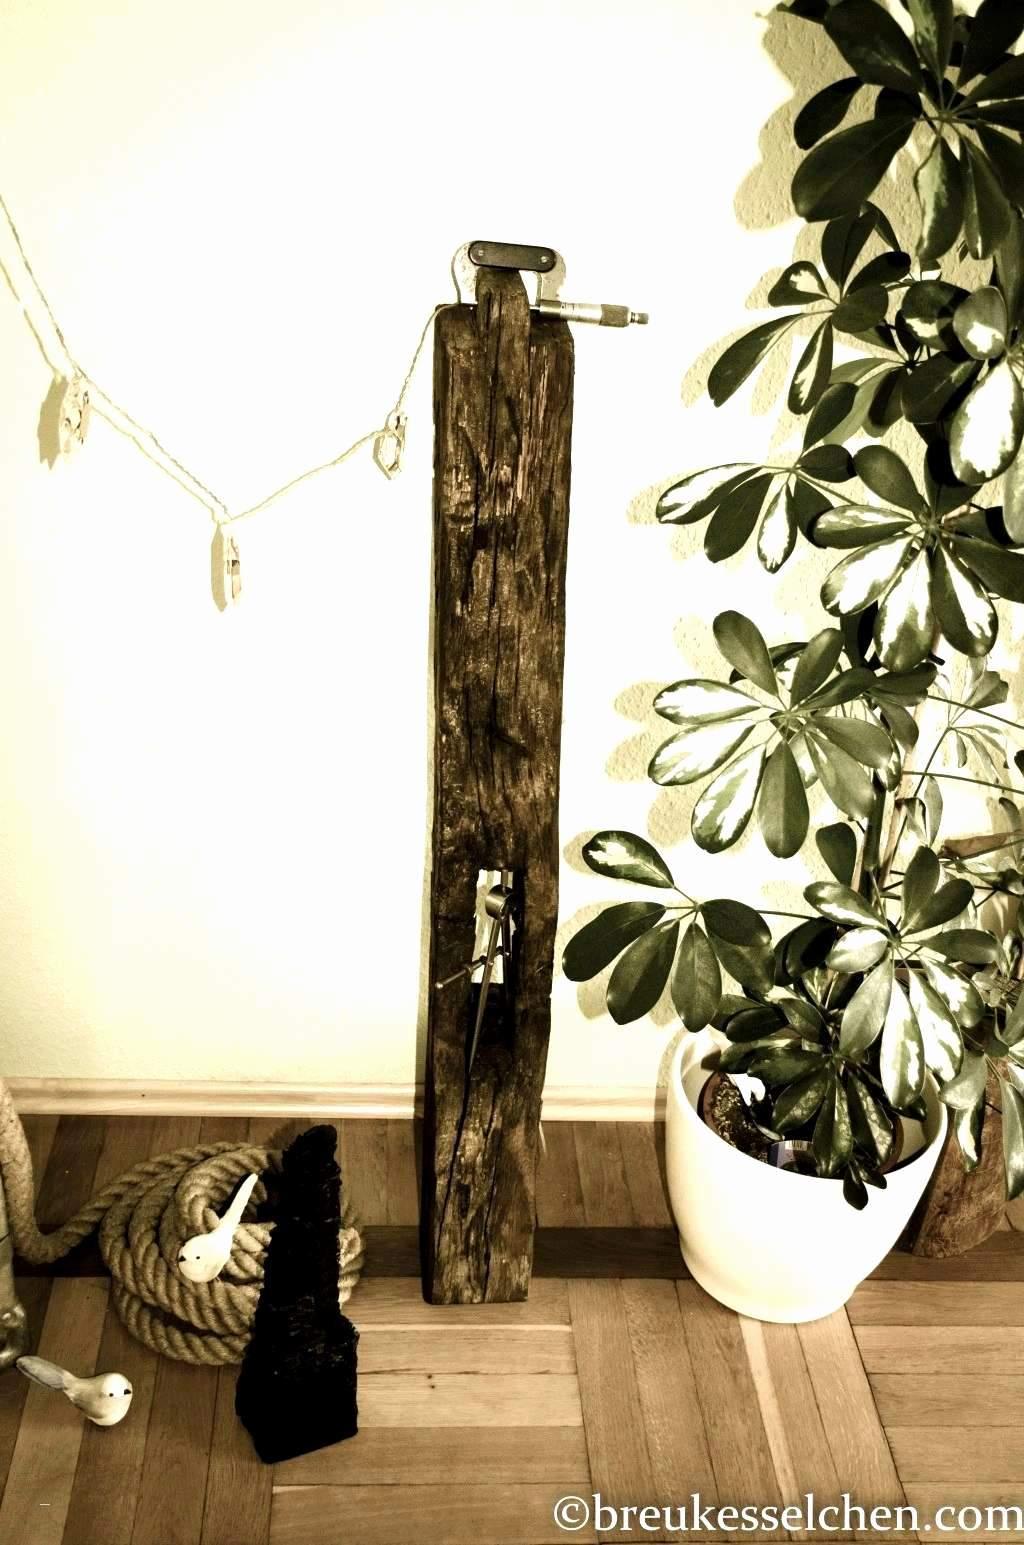 dekoideen wohnzimmer selber machen inspirierend 41 schon wanddeko selber machen holz moderne of dekoideen wohnzimmer selber machen